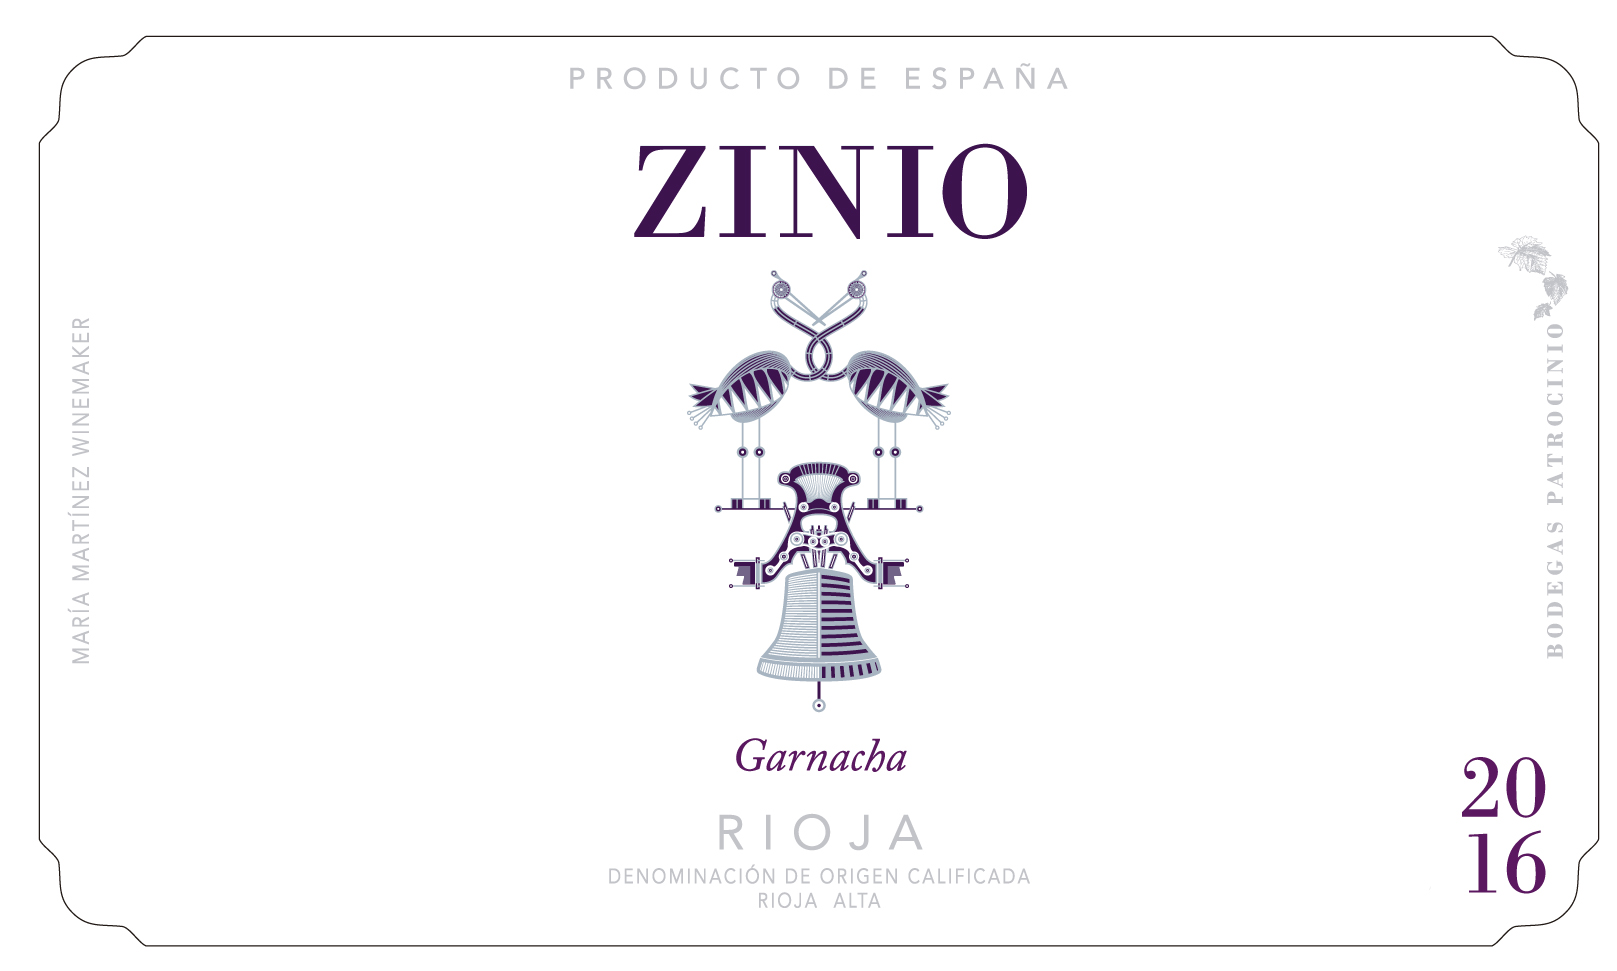 Zinio Garnacha